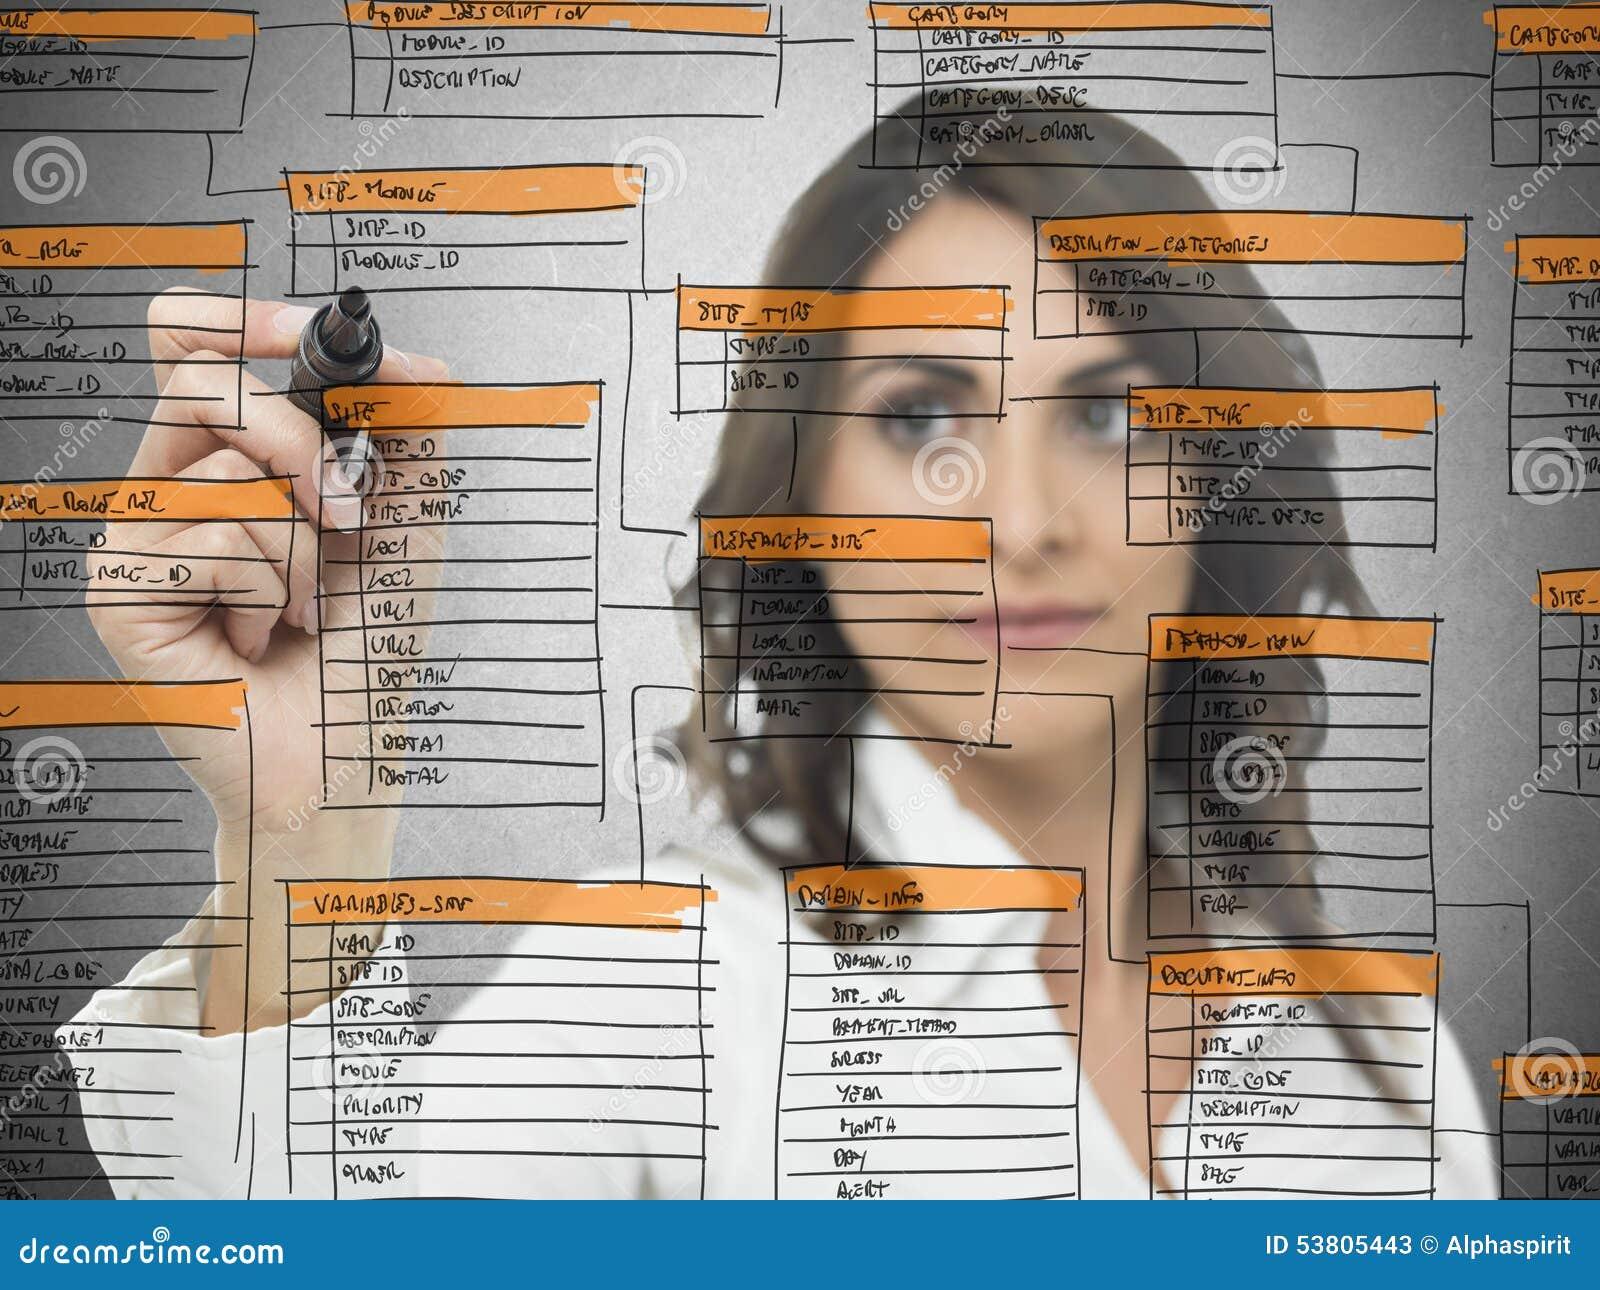 Database software development